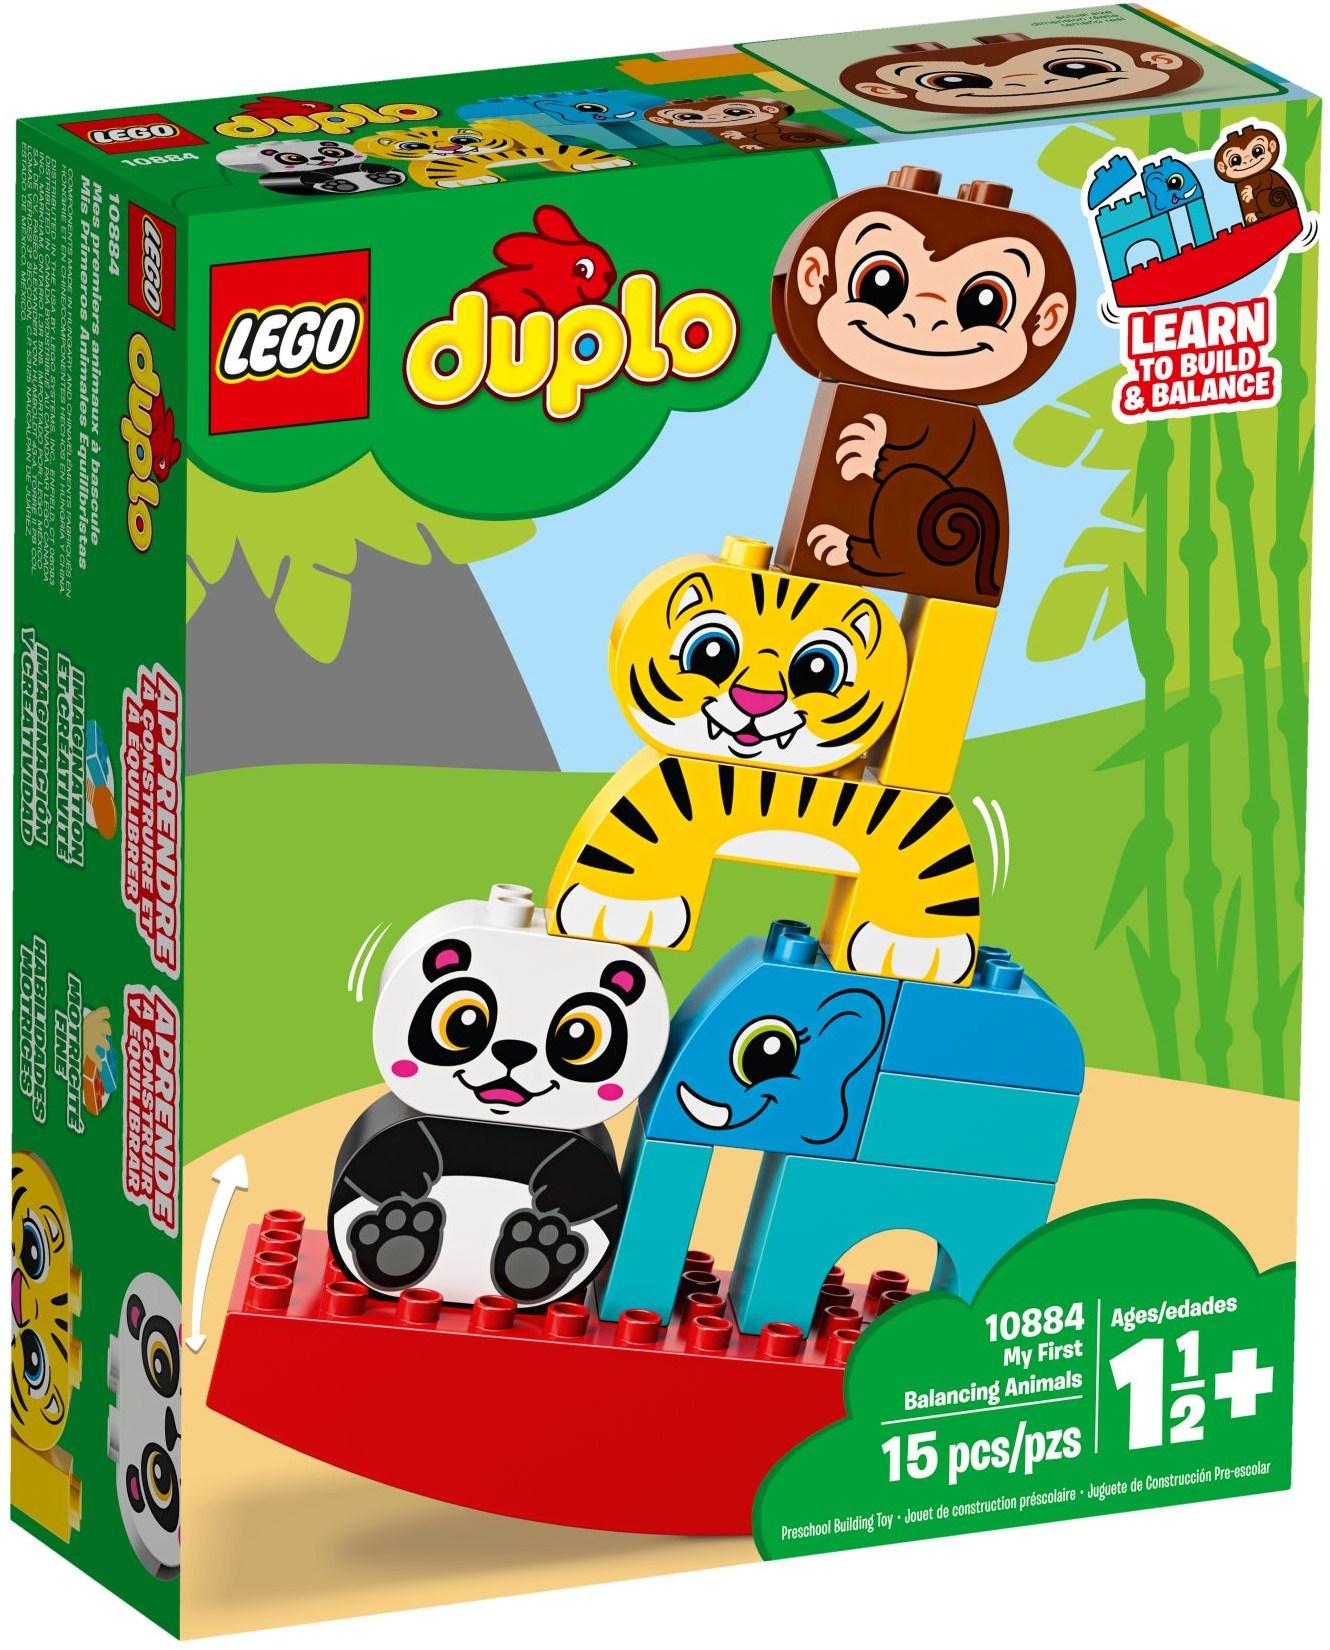 LEGO MY FIRST BALANCING ANIMALS - 10884